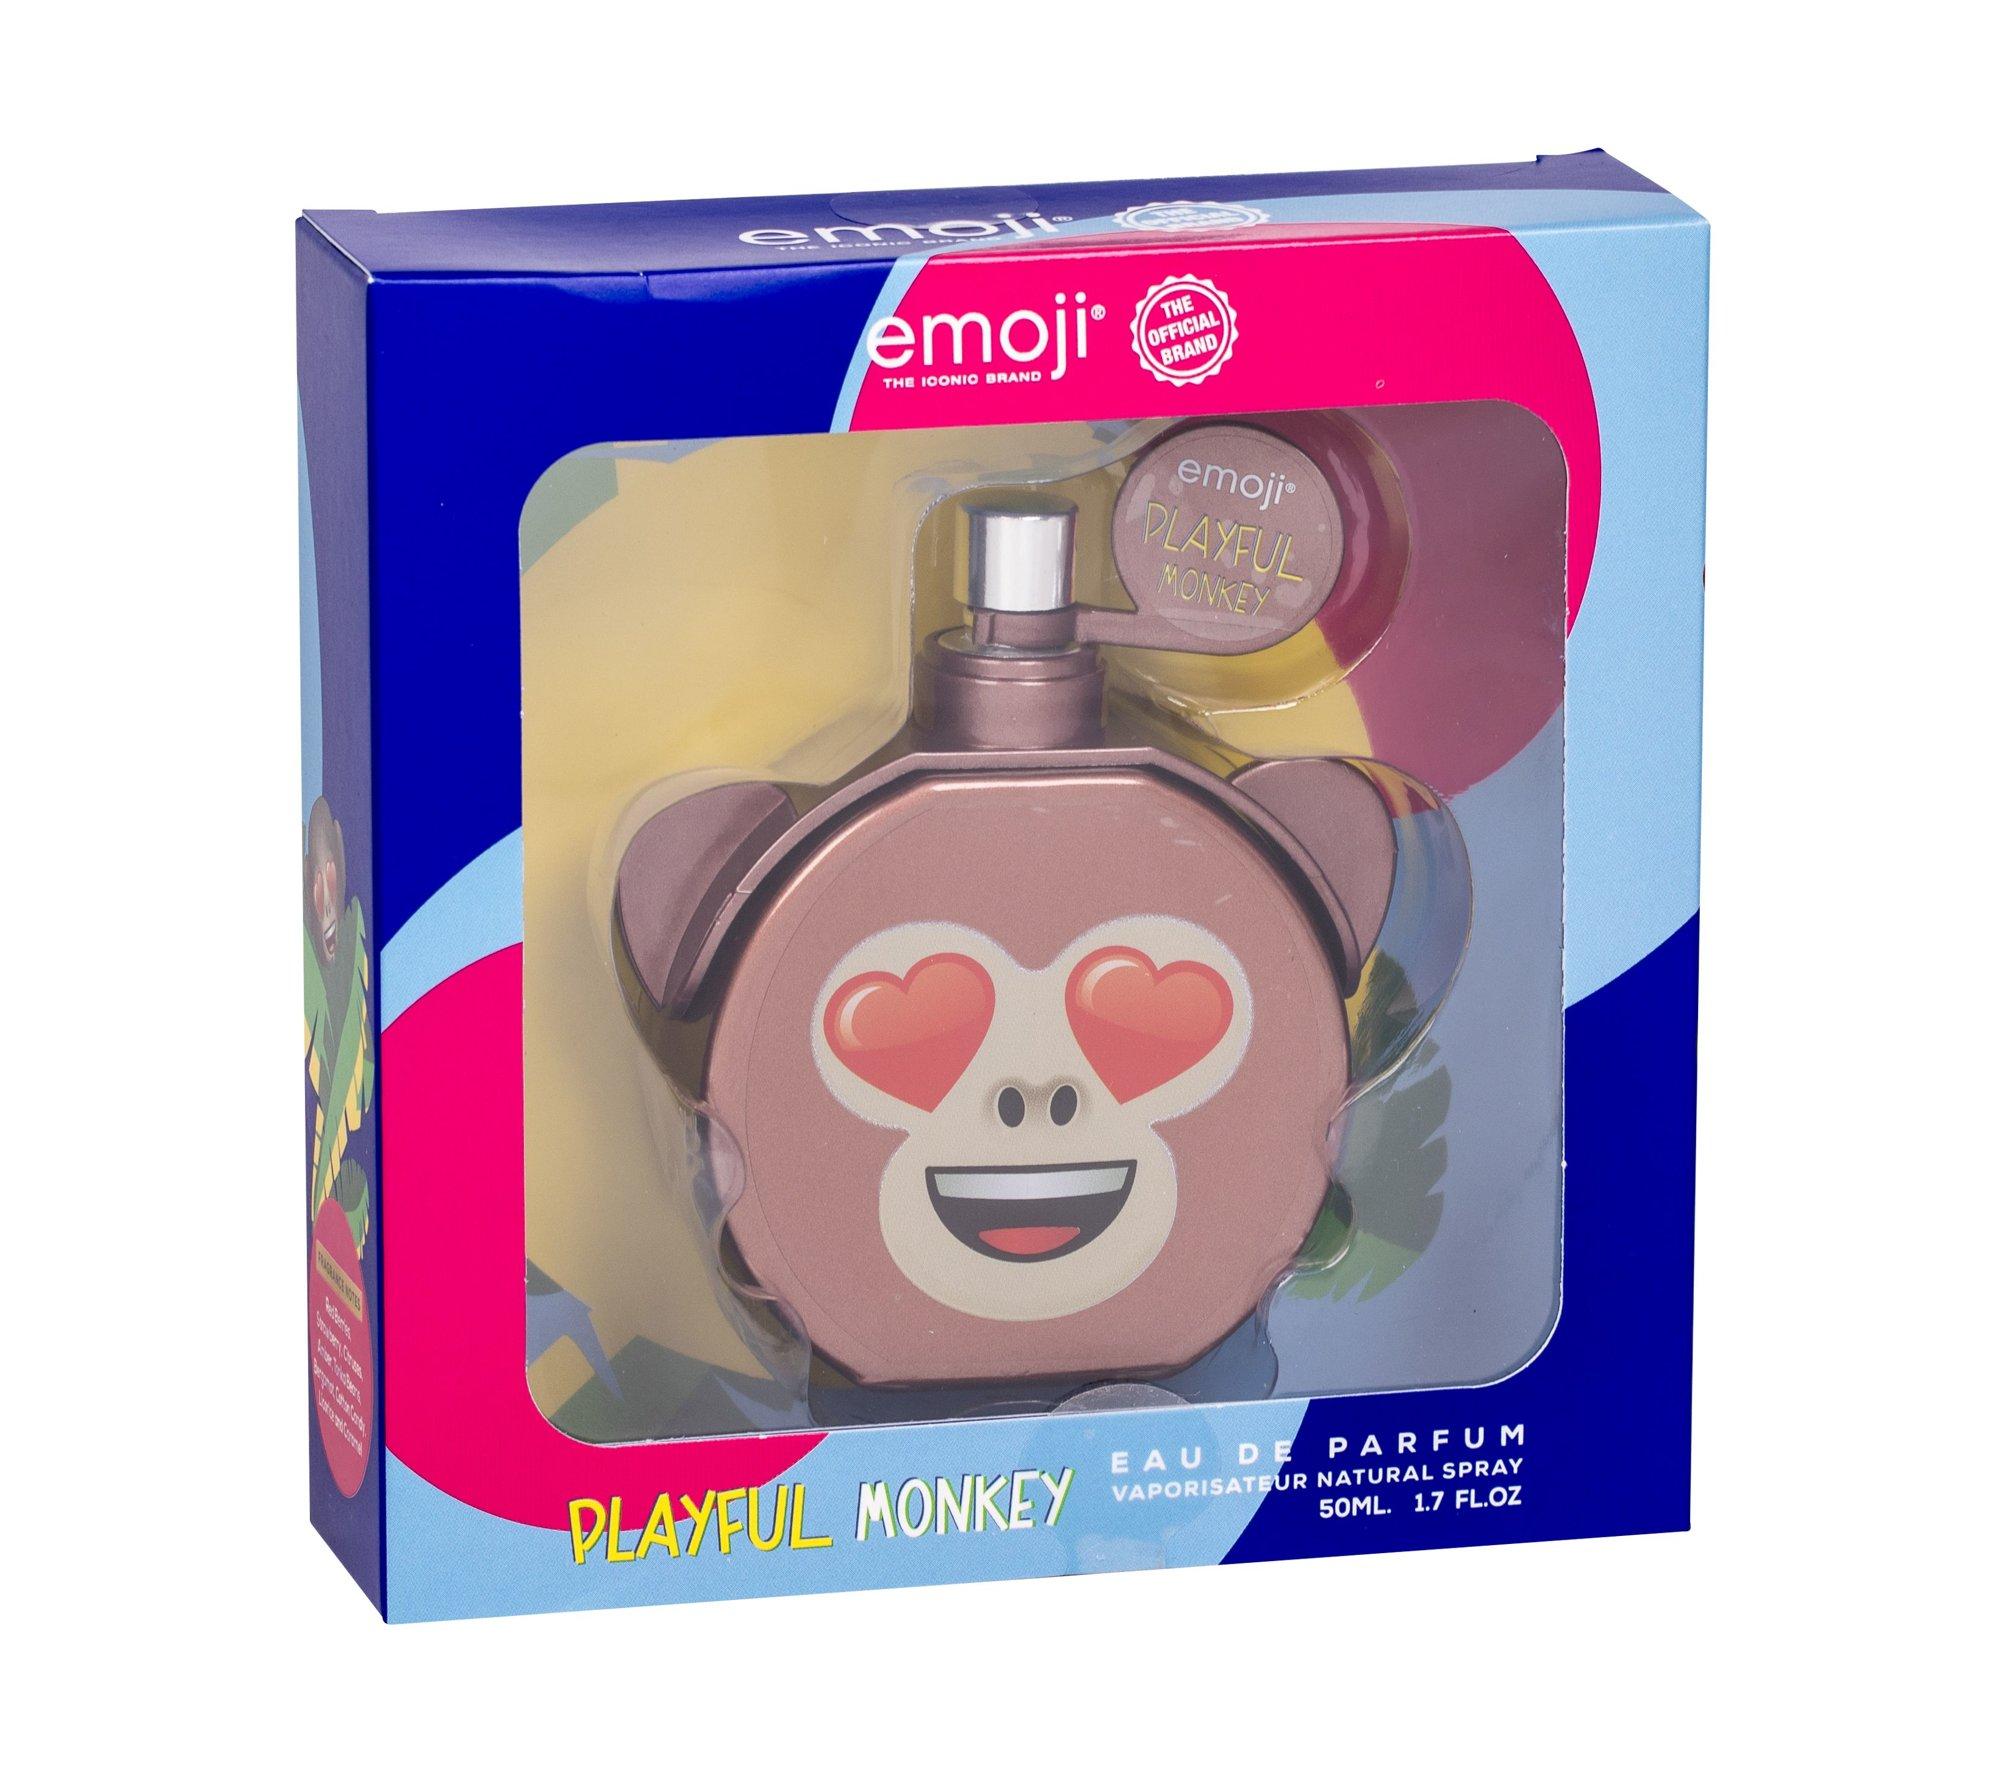 Emoji Playful Monkey